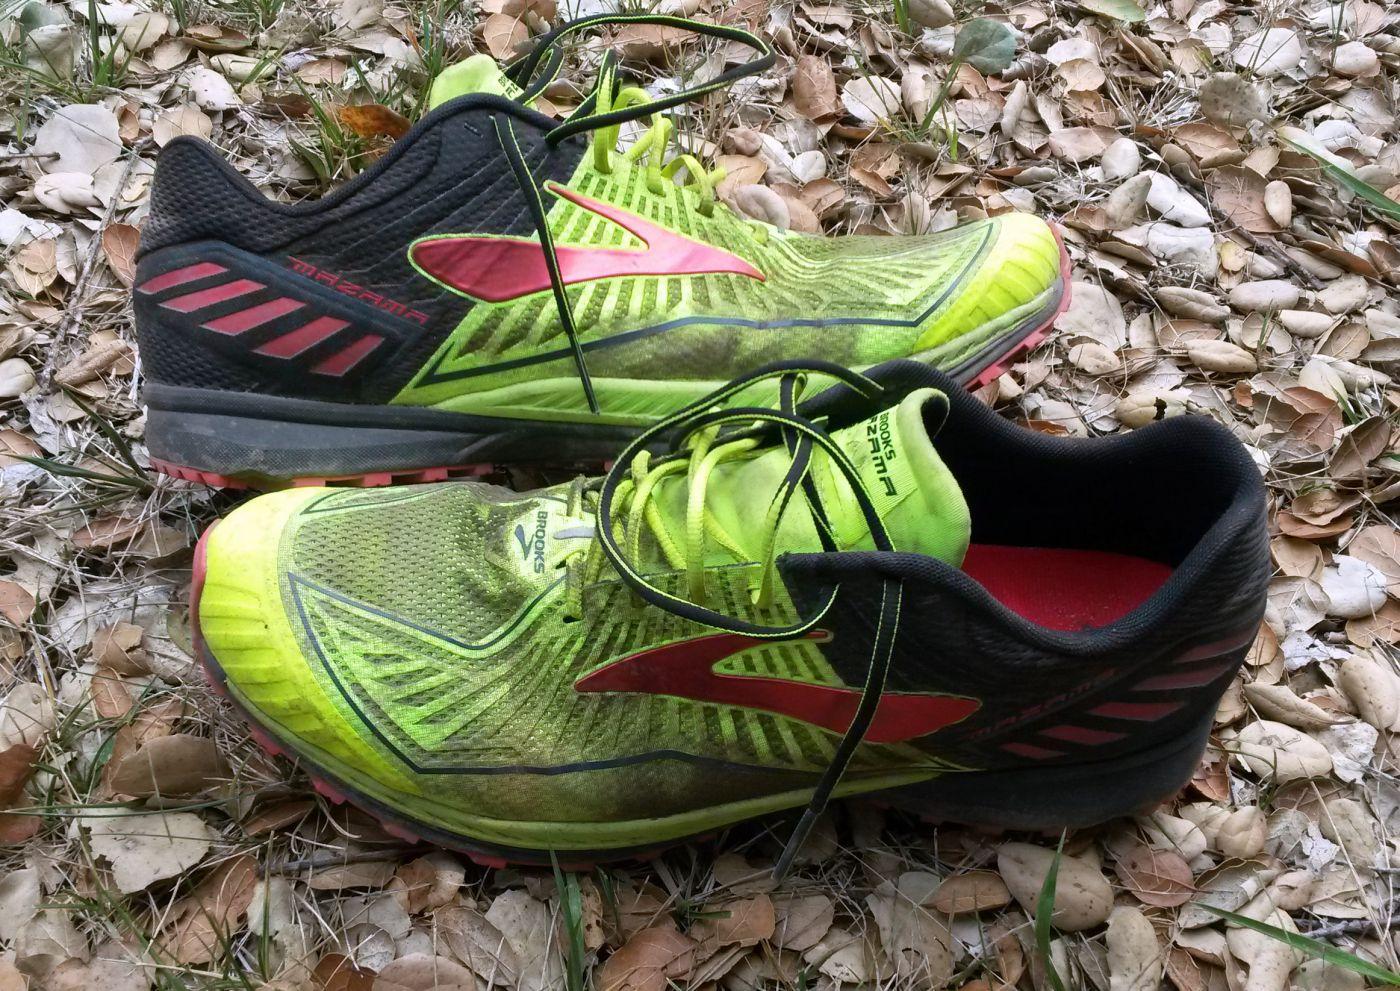 46035d01bfc Brooks Mazama Trail Running Shoe Review - FeedTheHabit.com